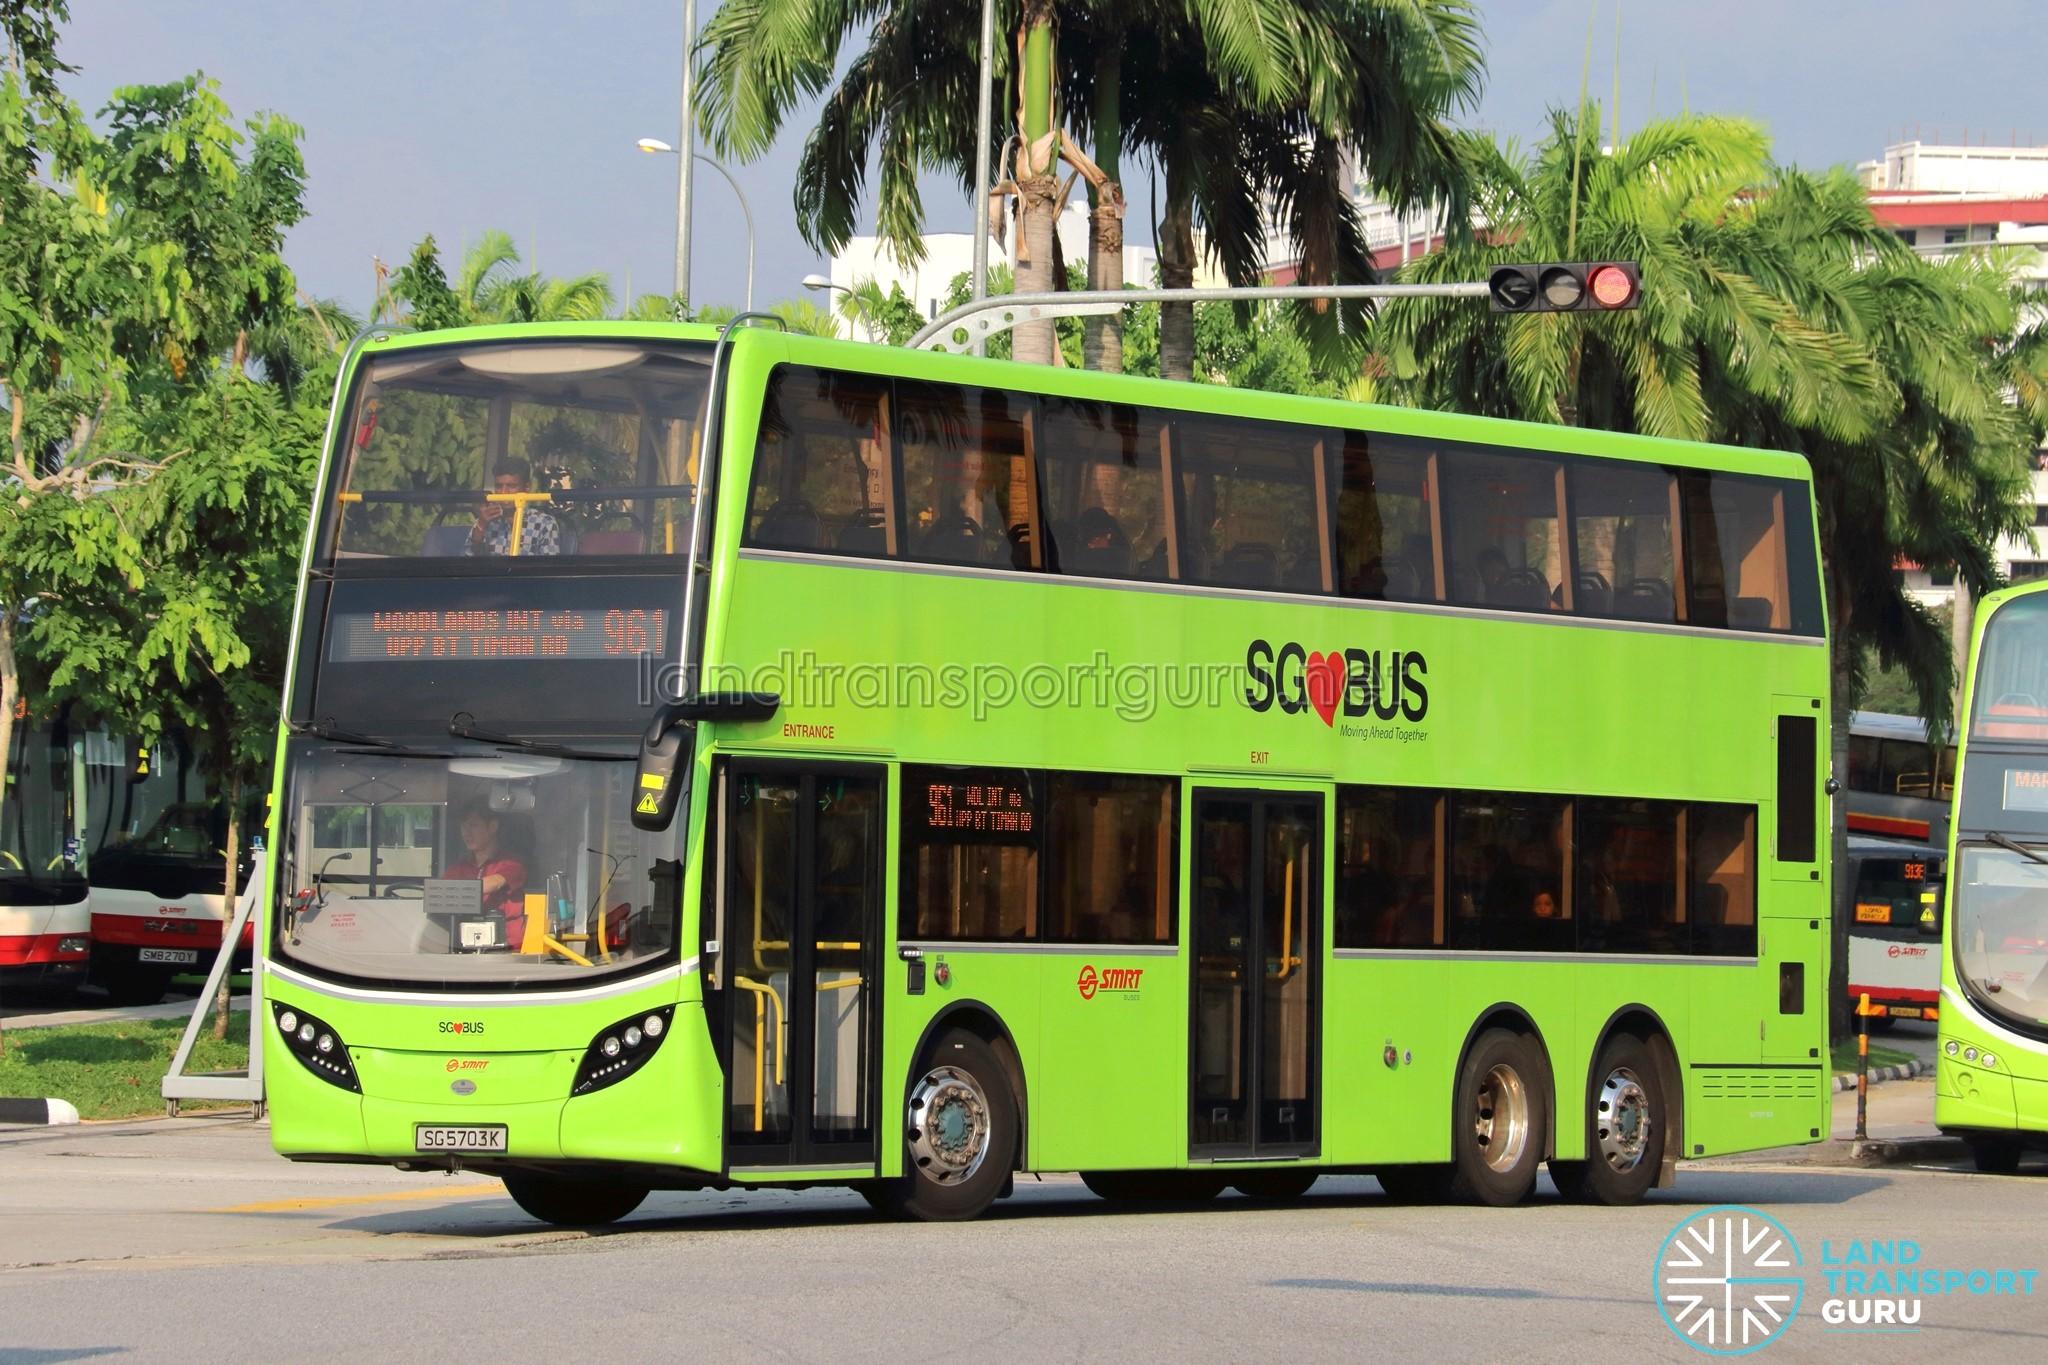 Service 961 - SMRT Buses Alexander Dennis Enviro500 (SG5703K)